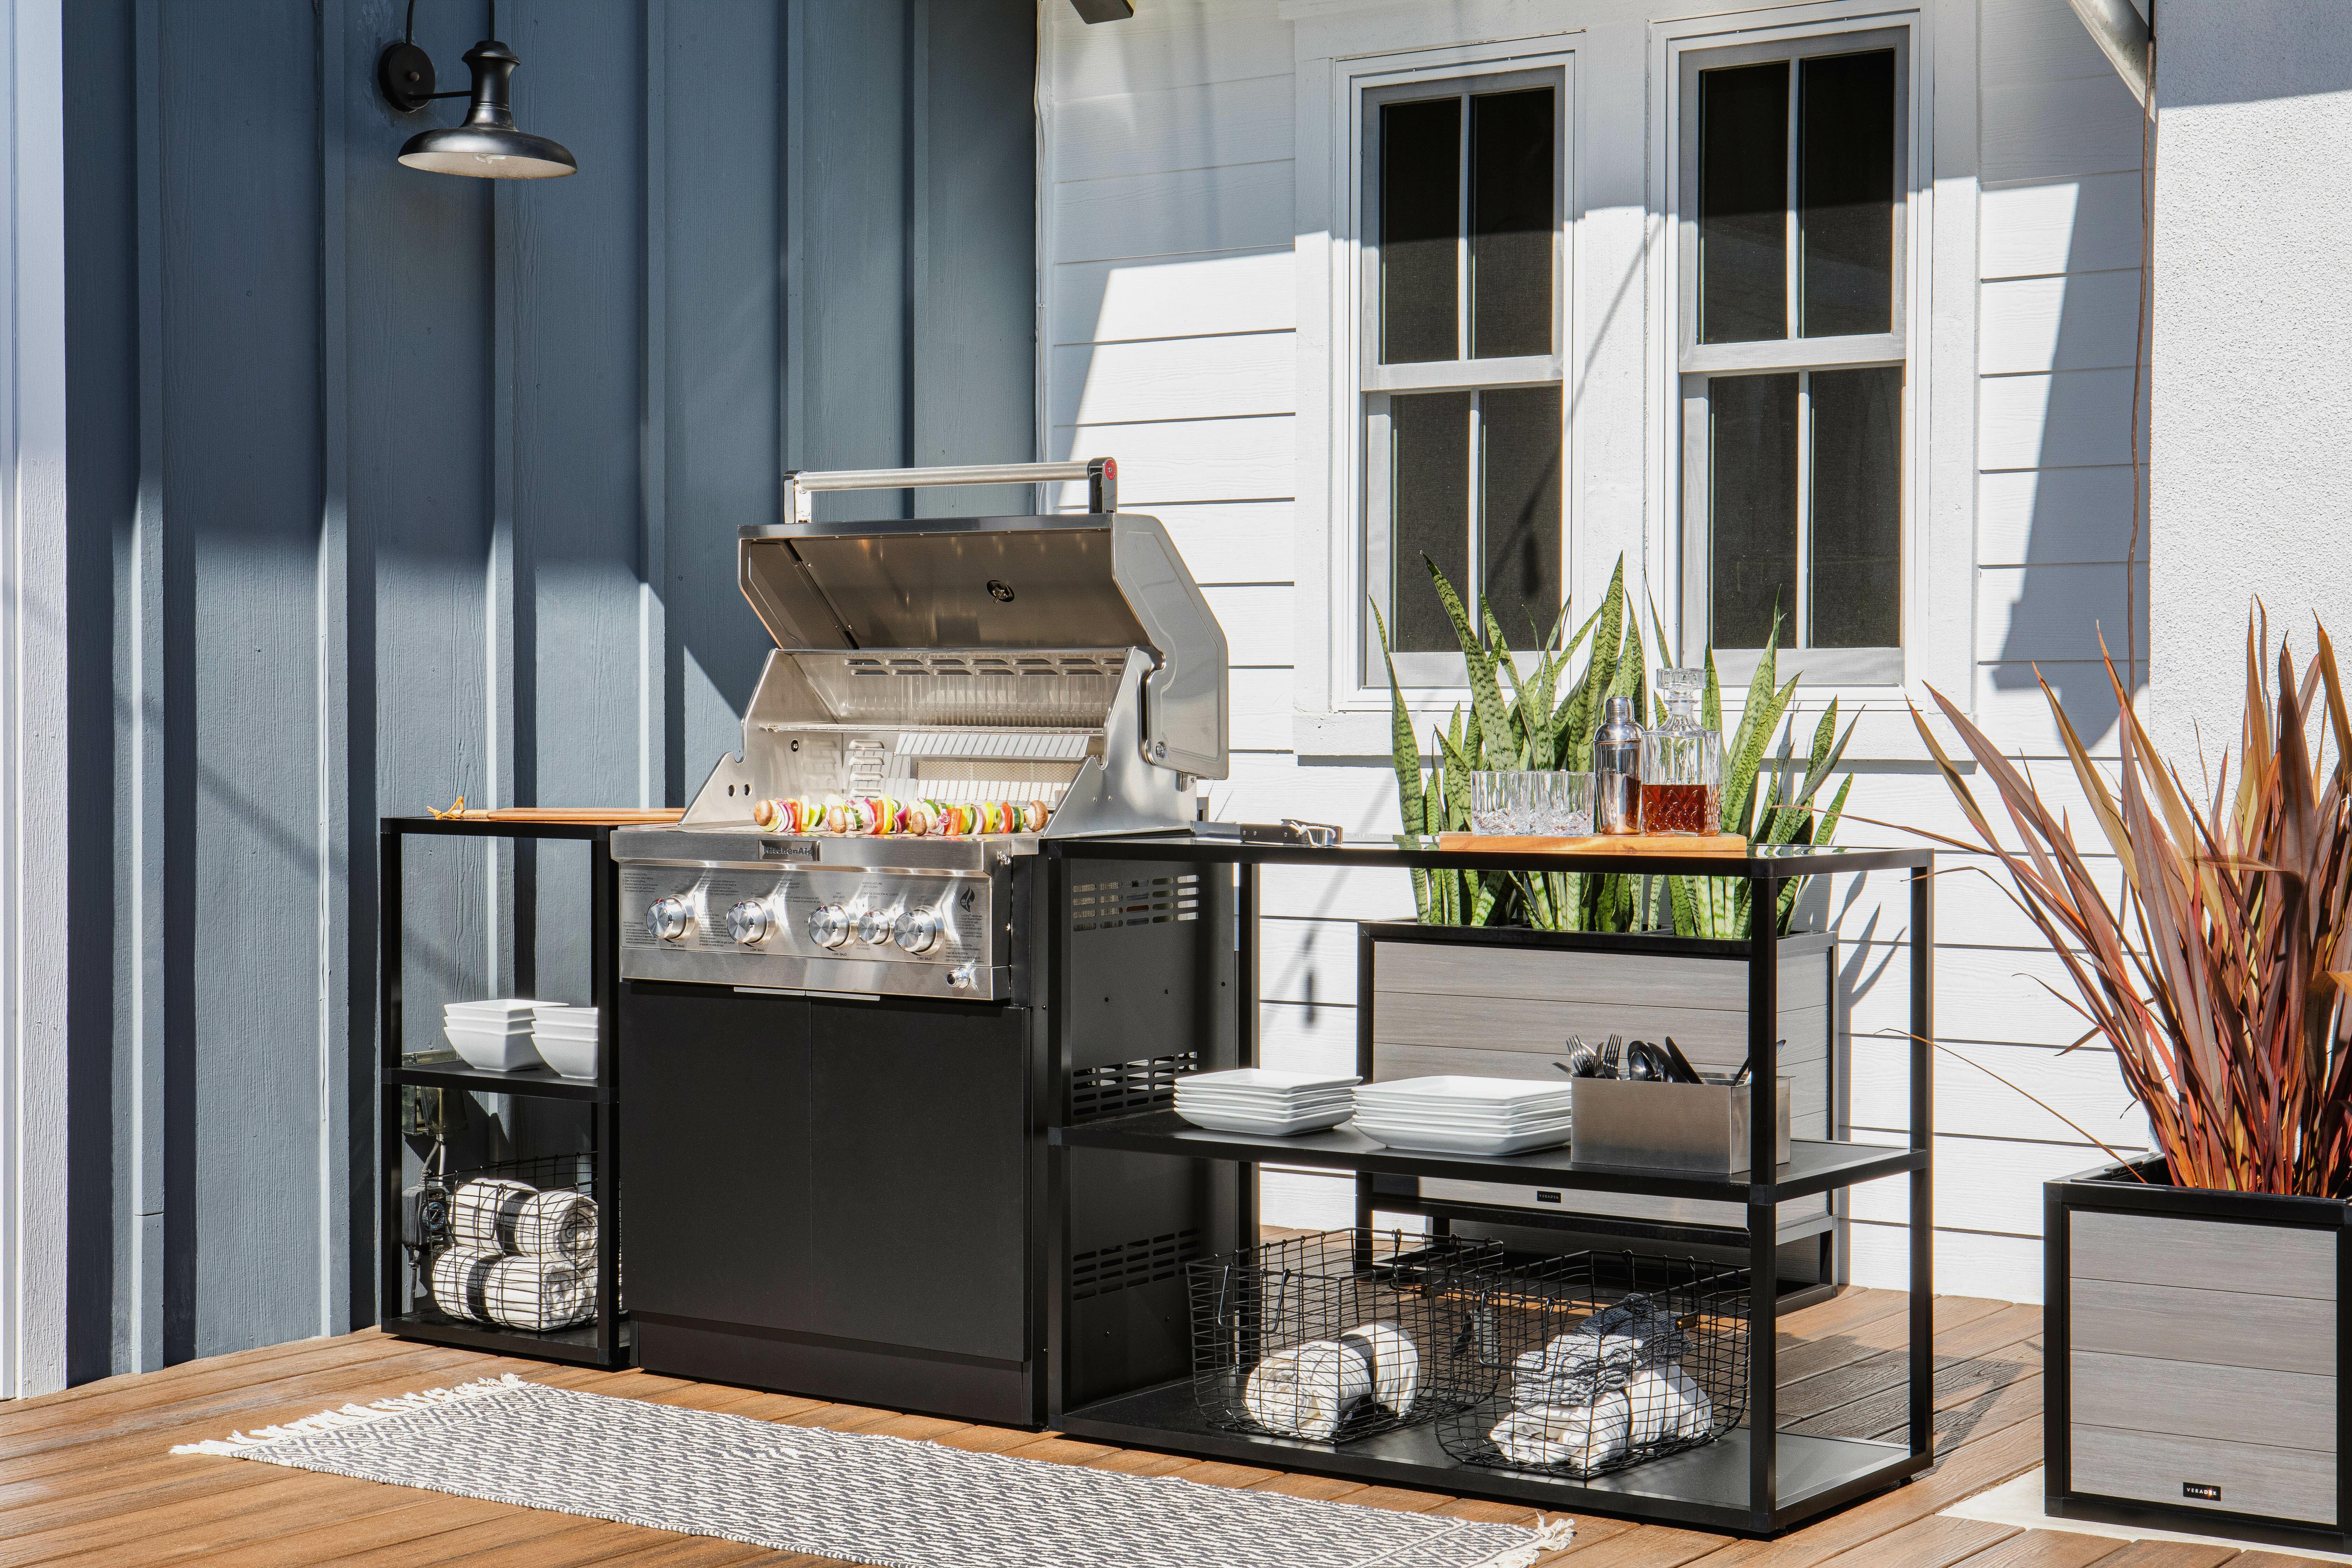 Veradek Outdoor Kitchen Series 3 Piece Modular Outdoor Kitchens Grill Not Included Reviews Wayfair